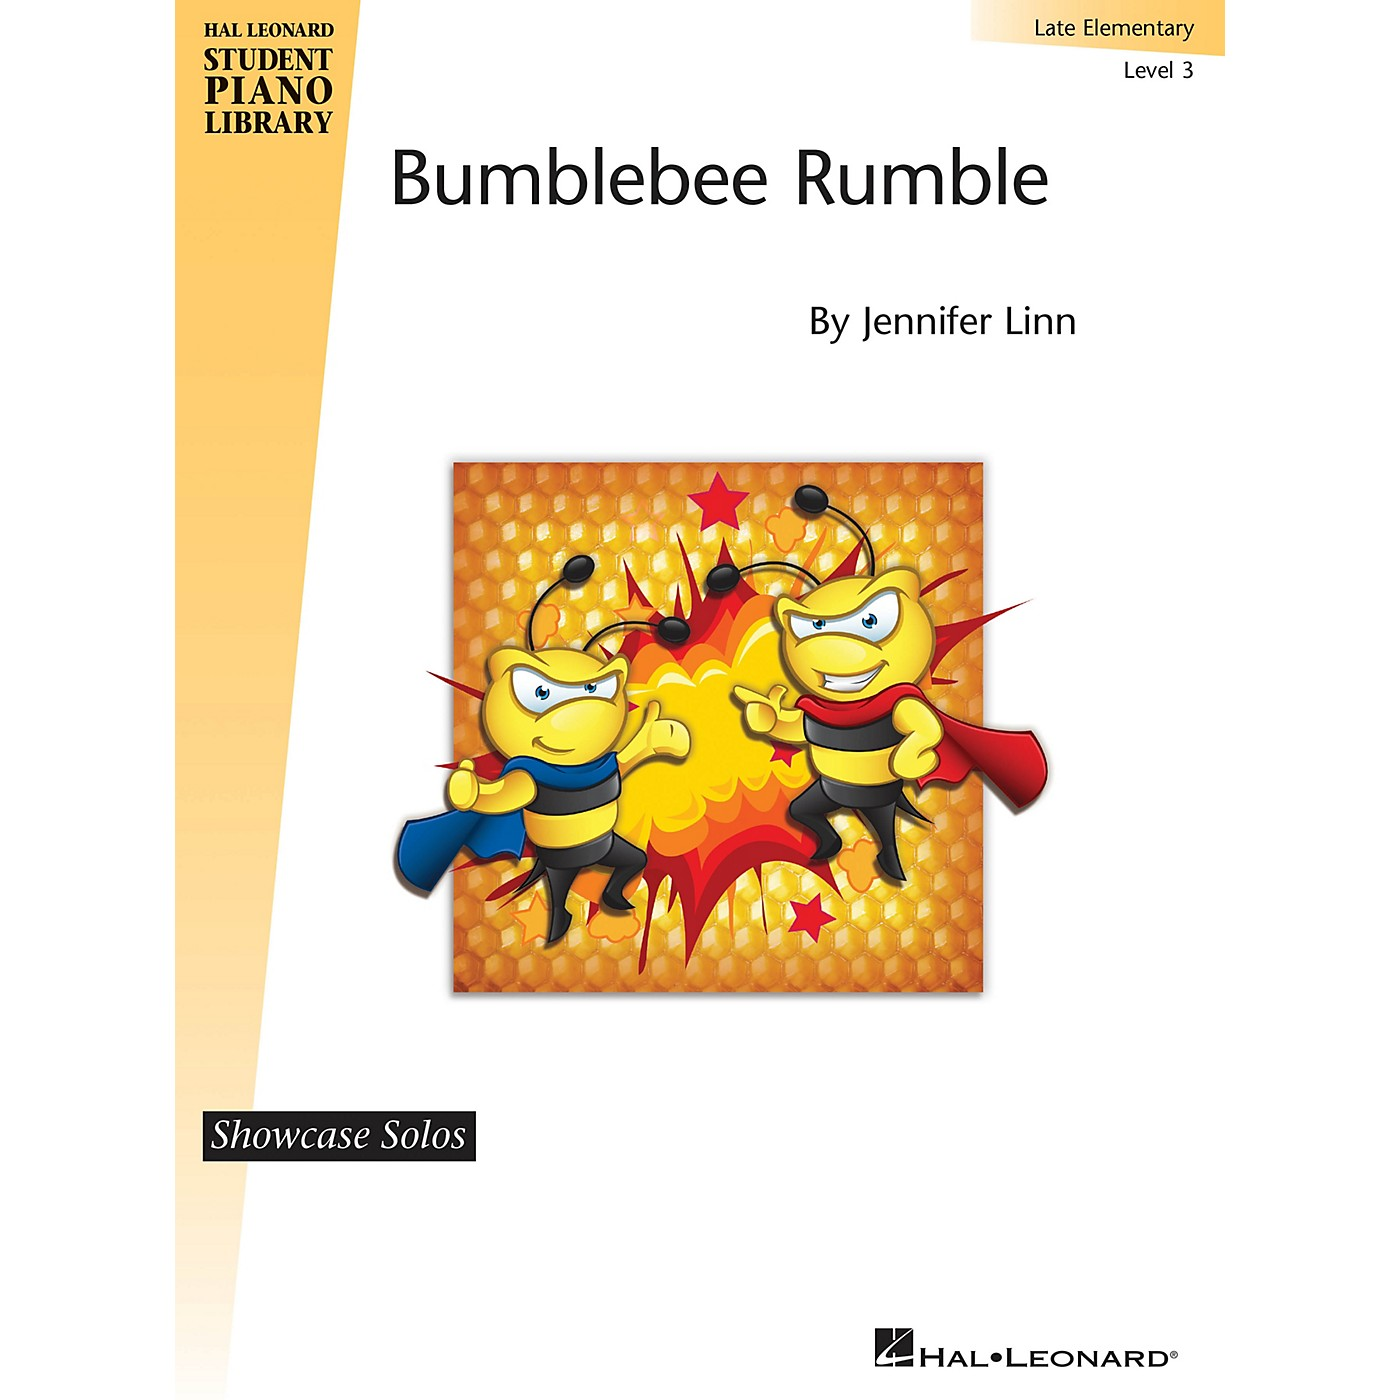 Hal Leonard Bumblebee Rumble Piano Library Series by Jennifer Linn (Level Late Elem) thumbnail